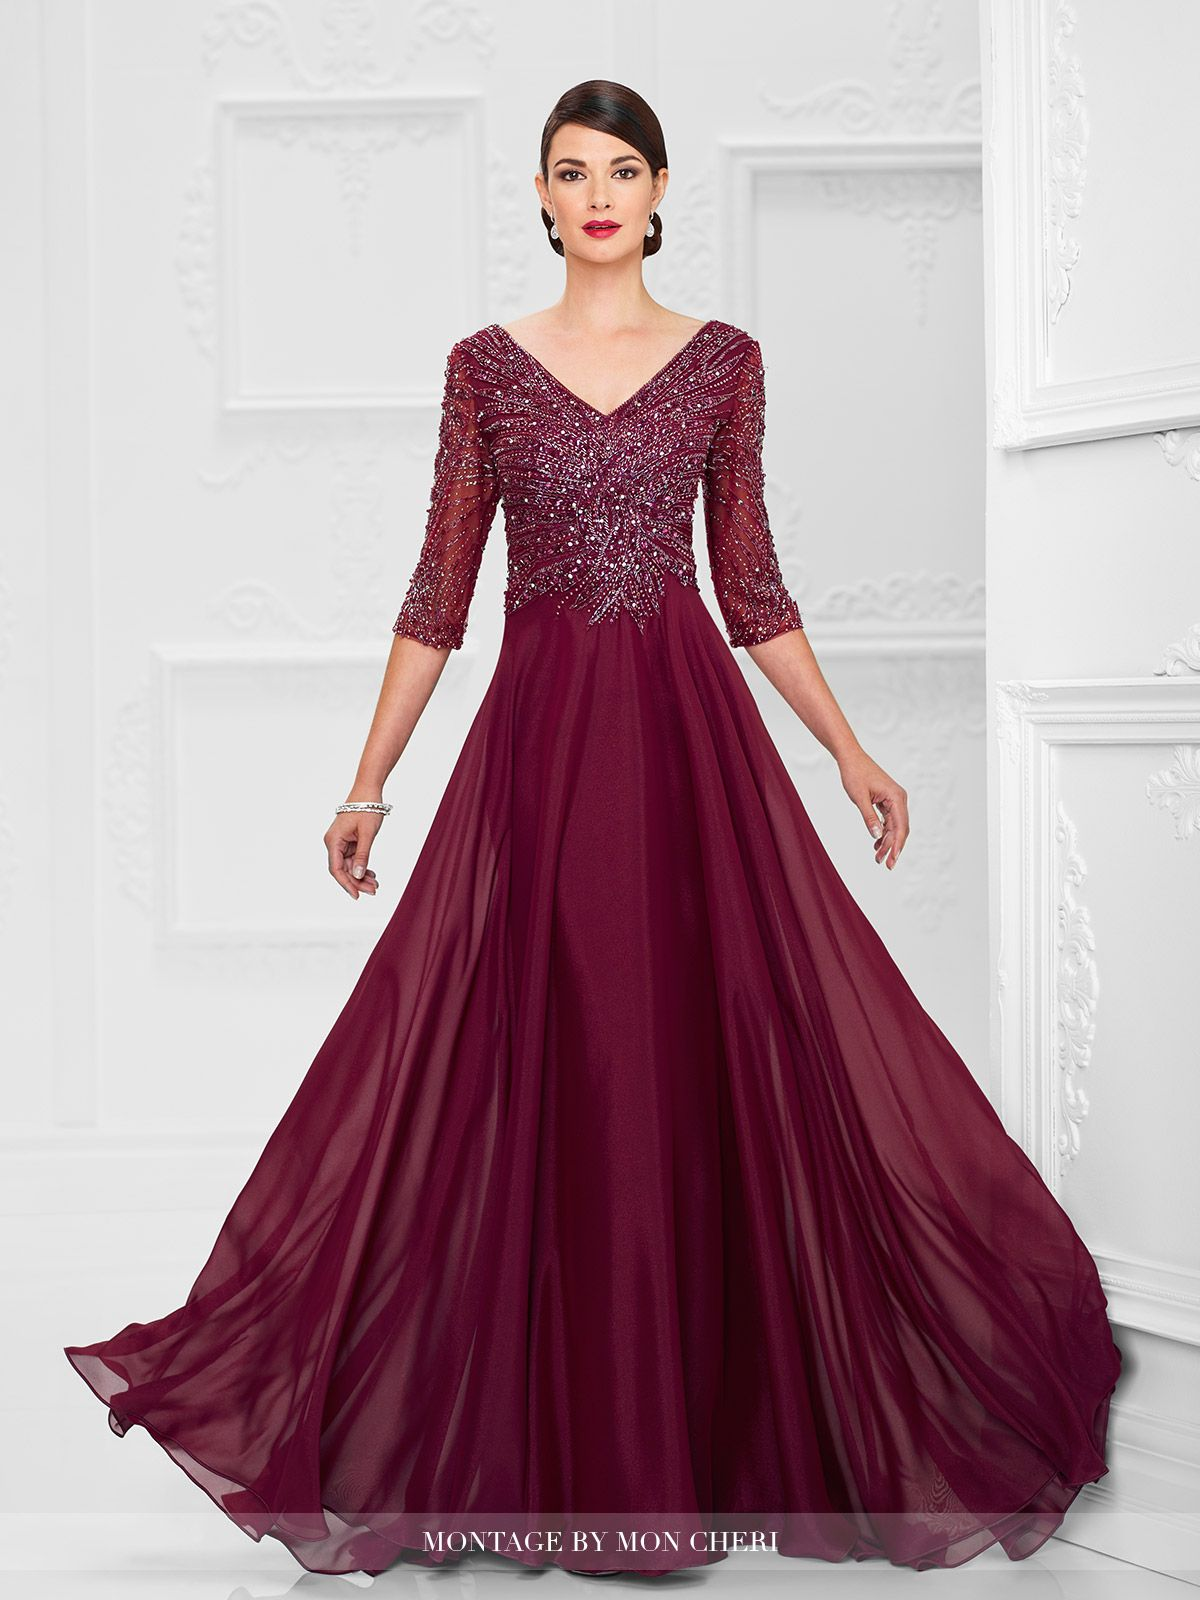 Diamond Chiffon A-Line Gown - Montage by Mon Cheri 116950 | Clothes ...